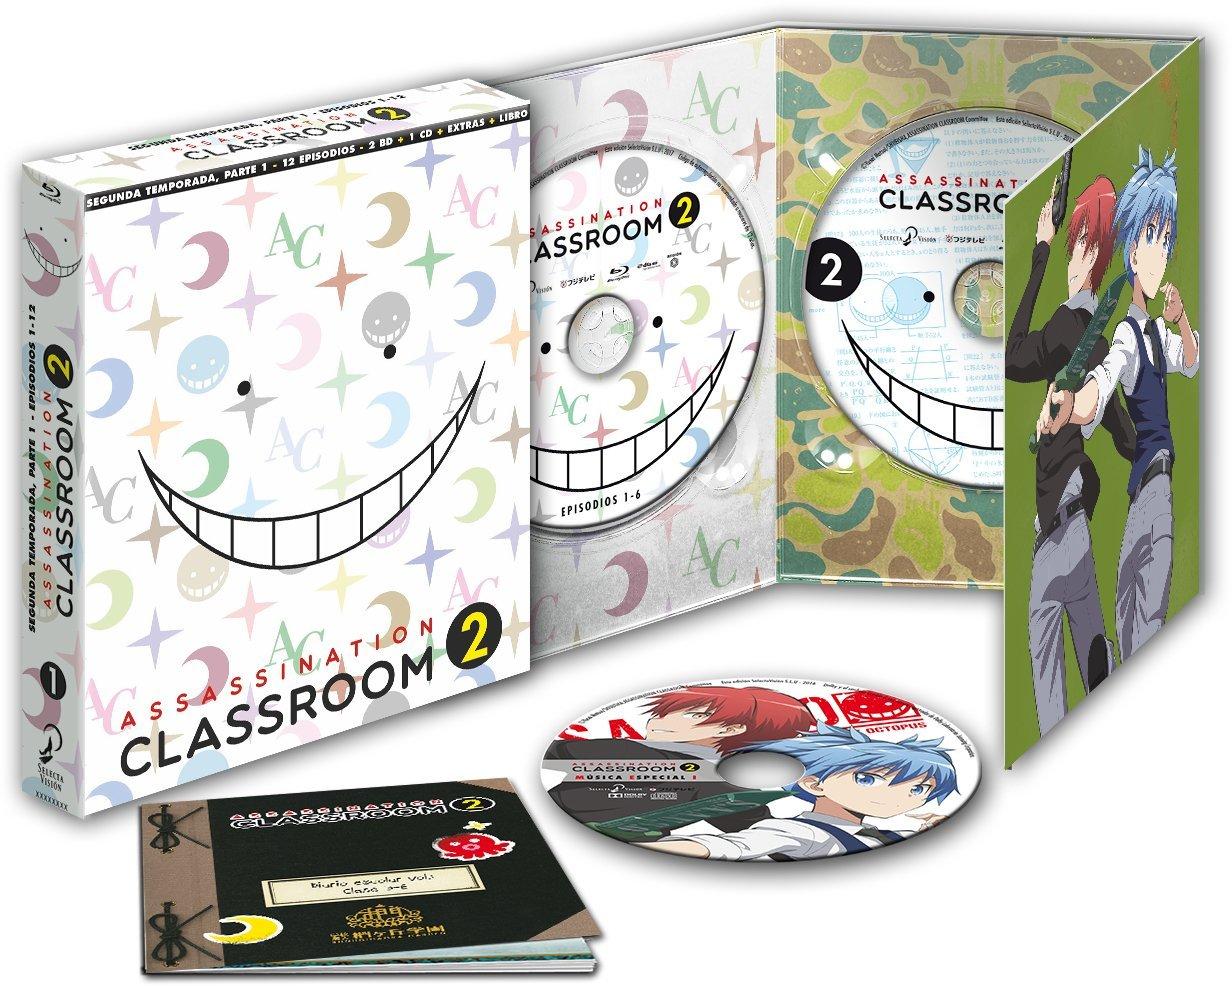 Assassination Classroom Temporada 2 Parte 1 en Blu-ray